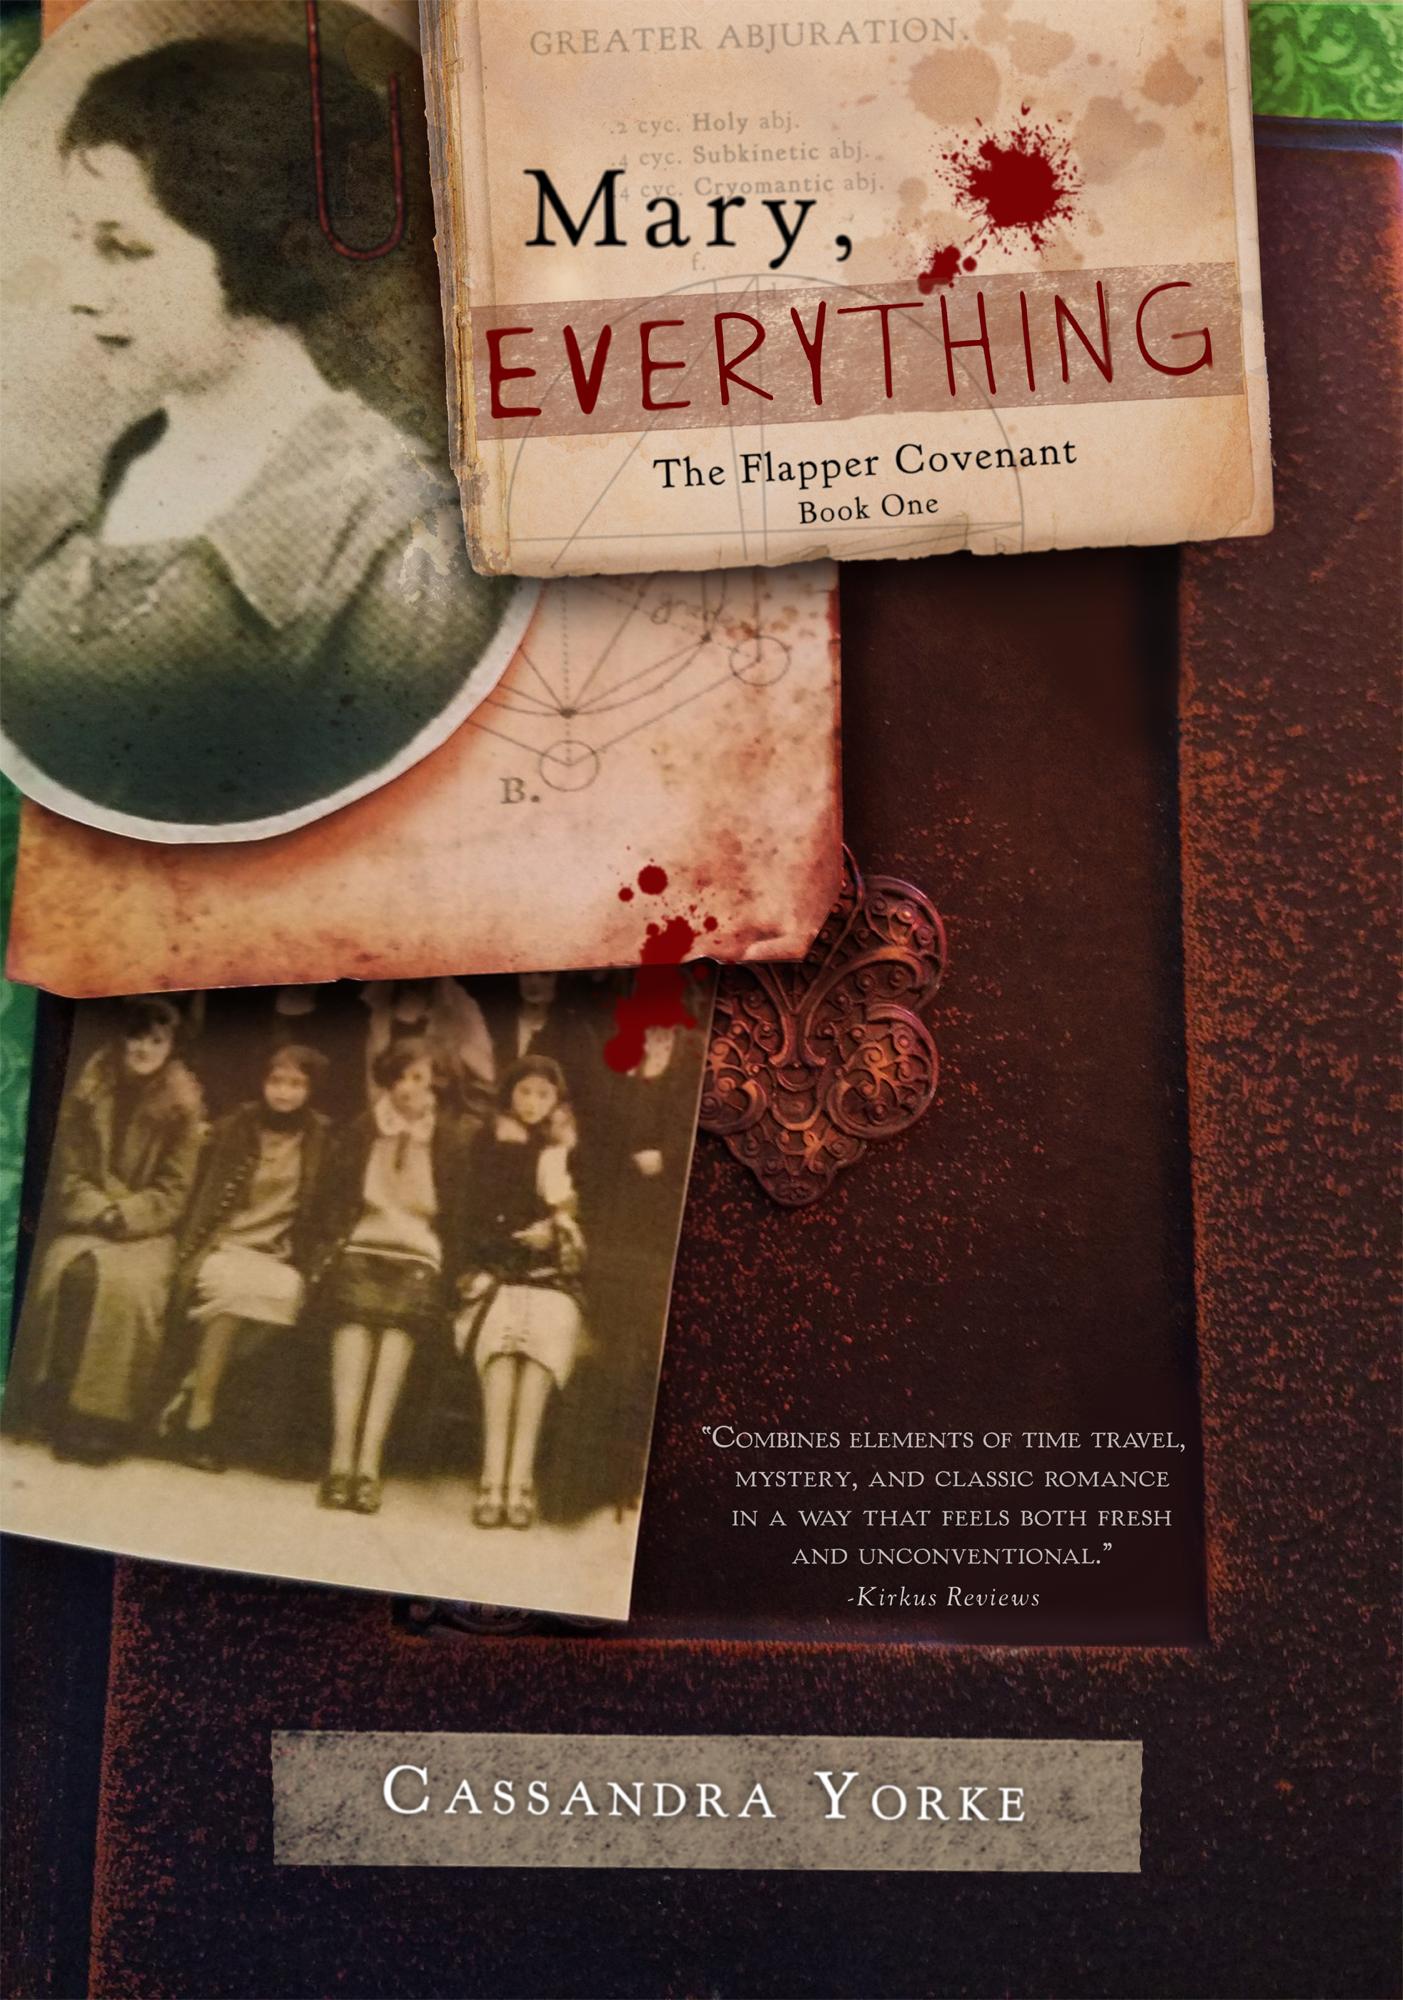 Mary, Everything by Cassandra Yorke